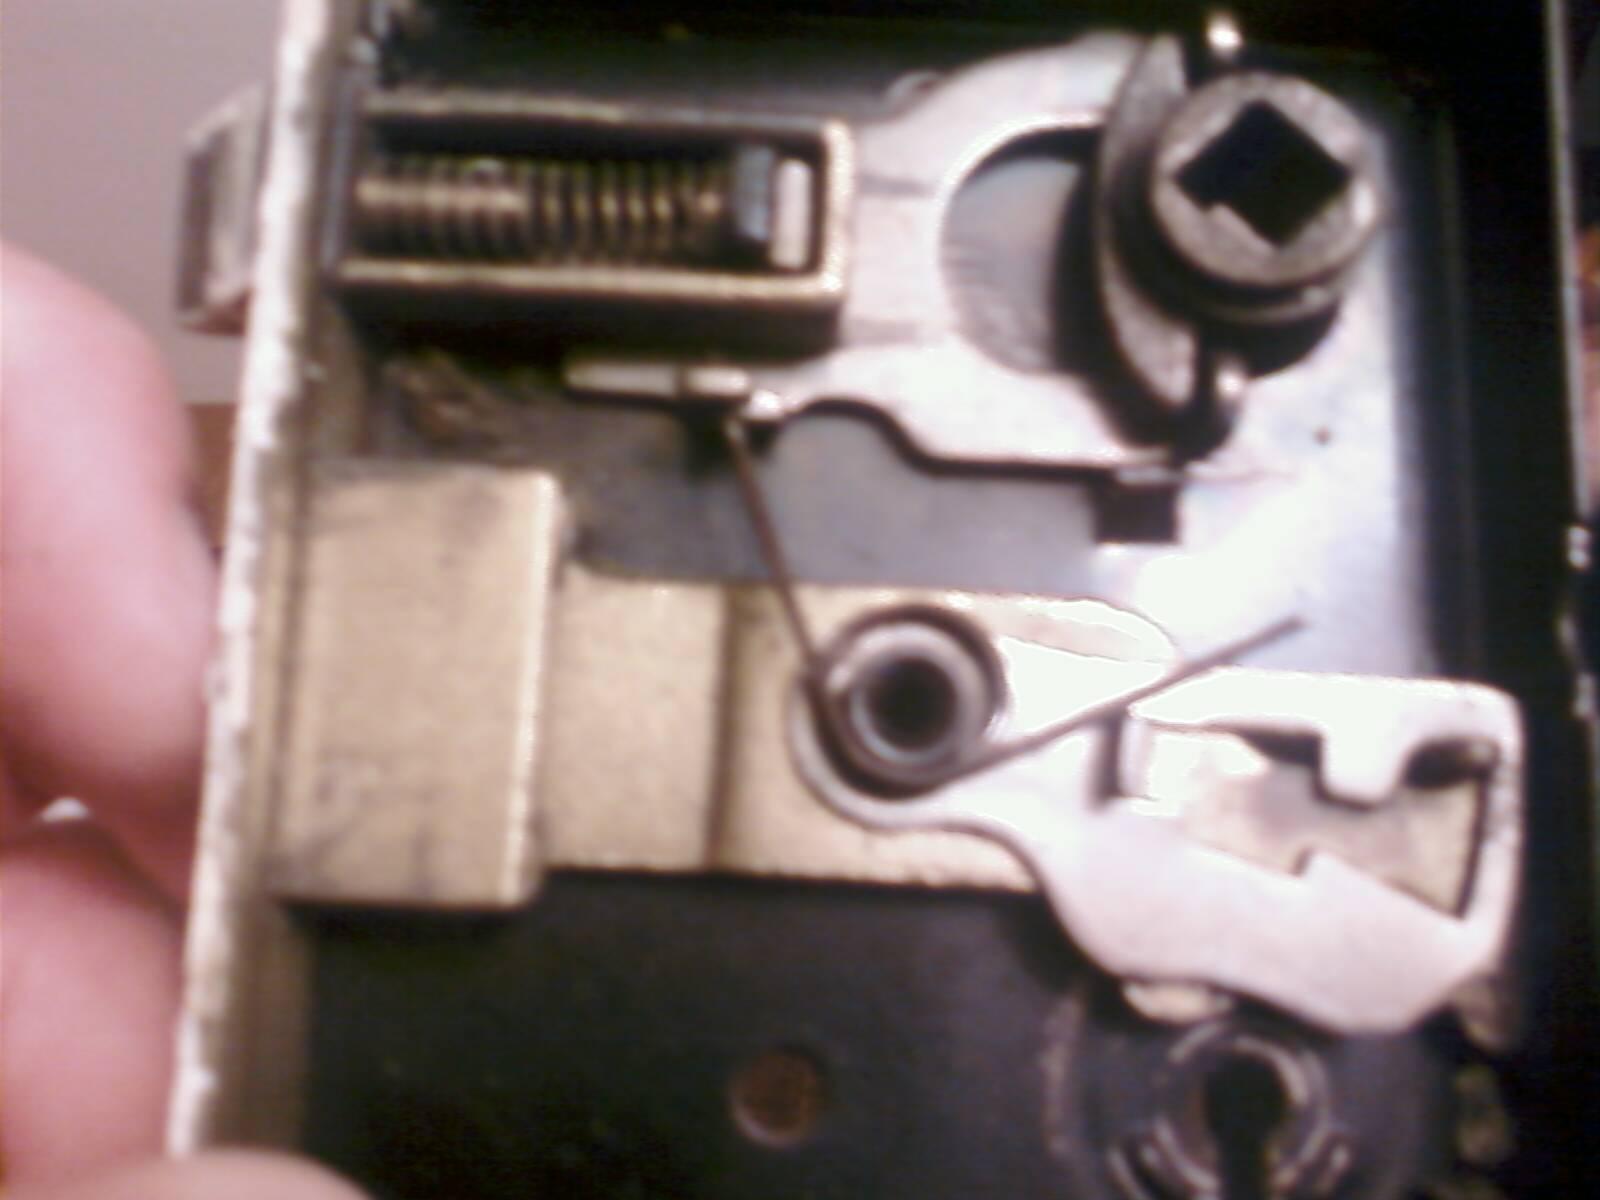 Fixing Old Doorknob - General DIY Discussions - DIY Chatroom Home ...